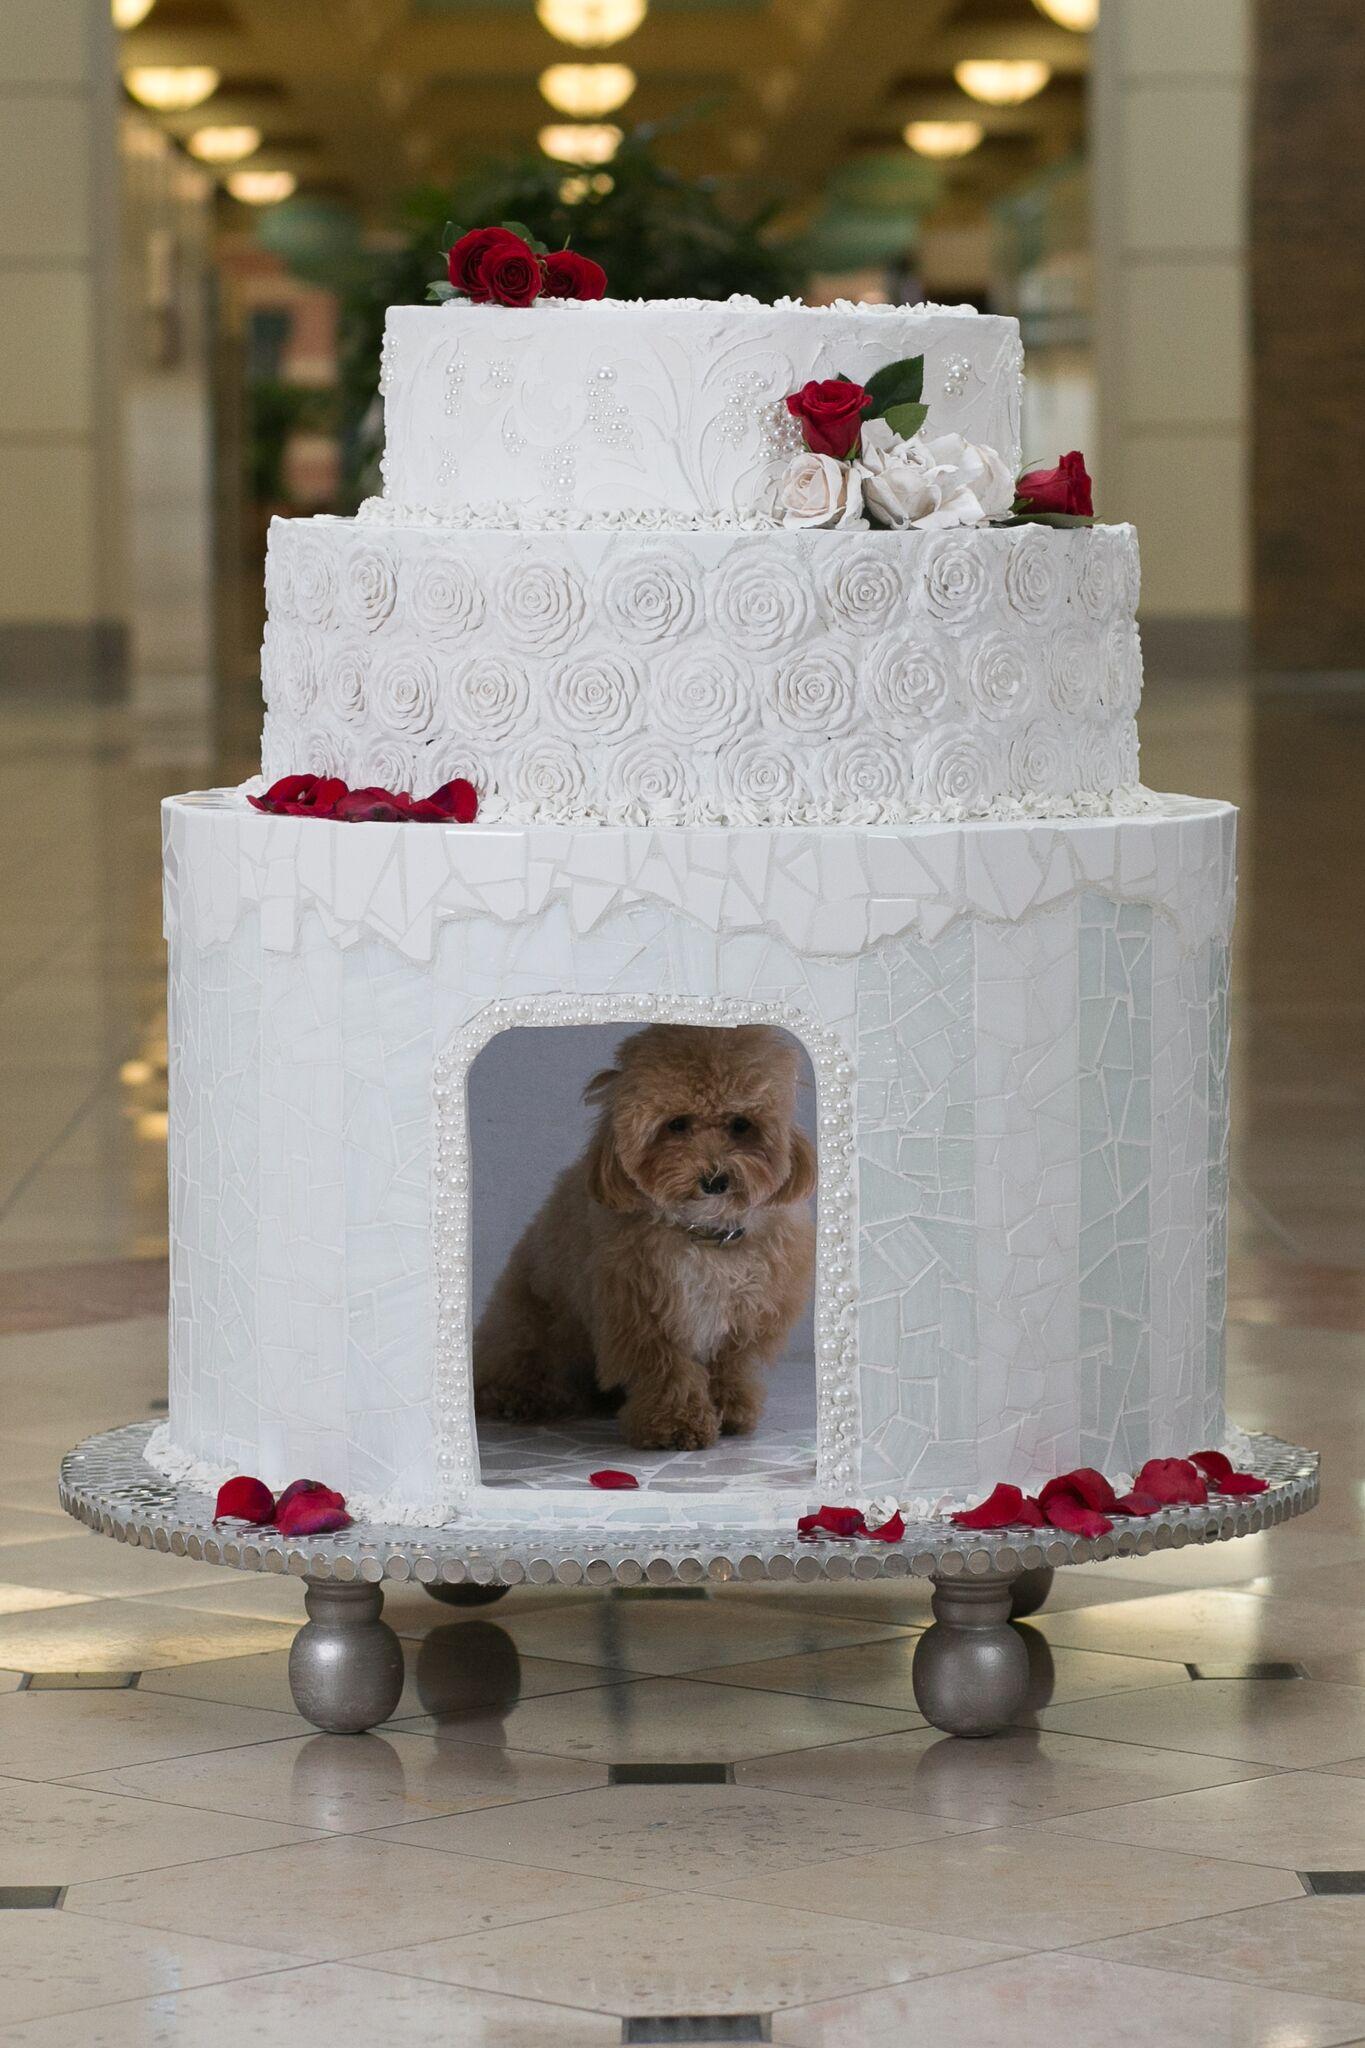 Jeff Monsein - The Royal Wedding Cake House - Image 6 of 9